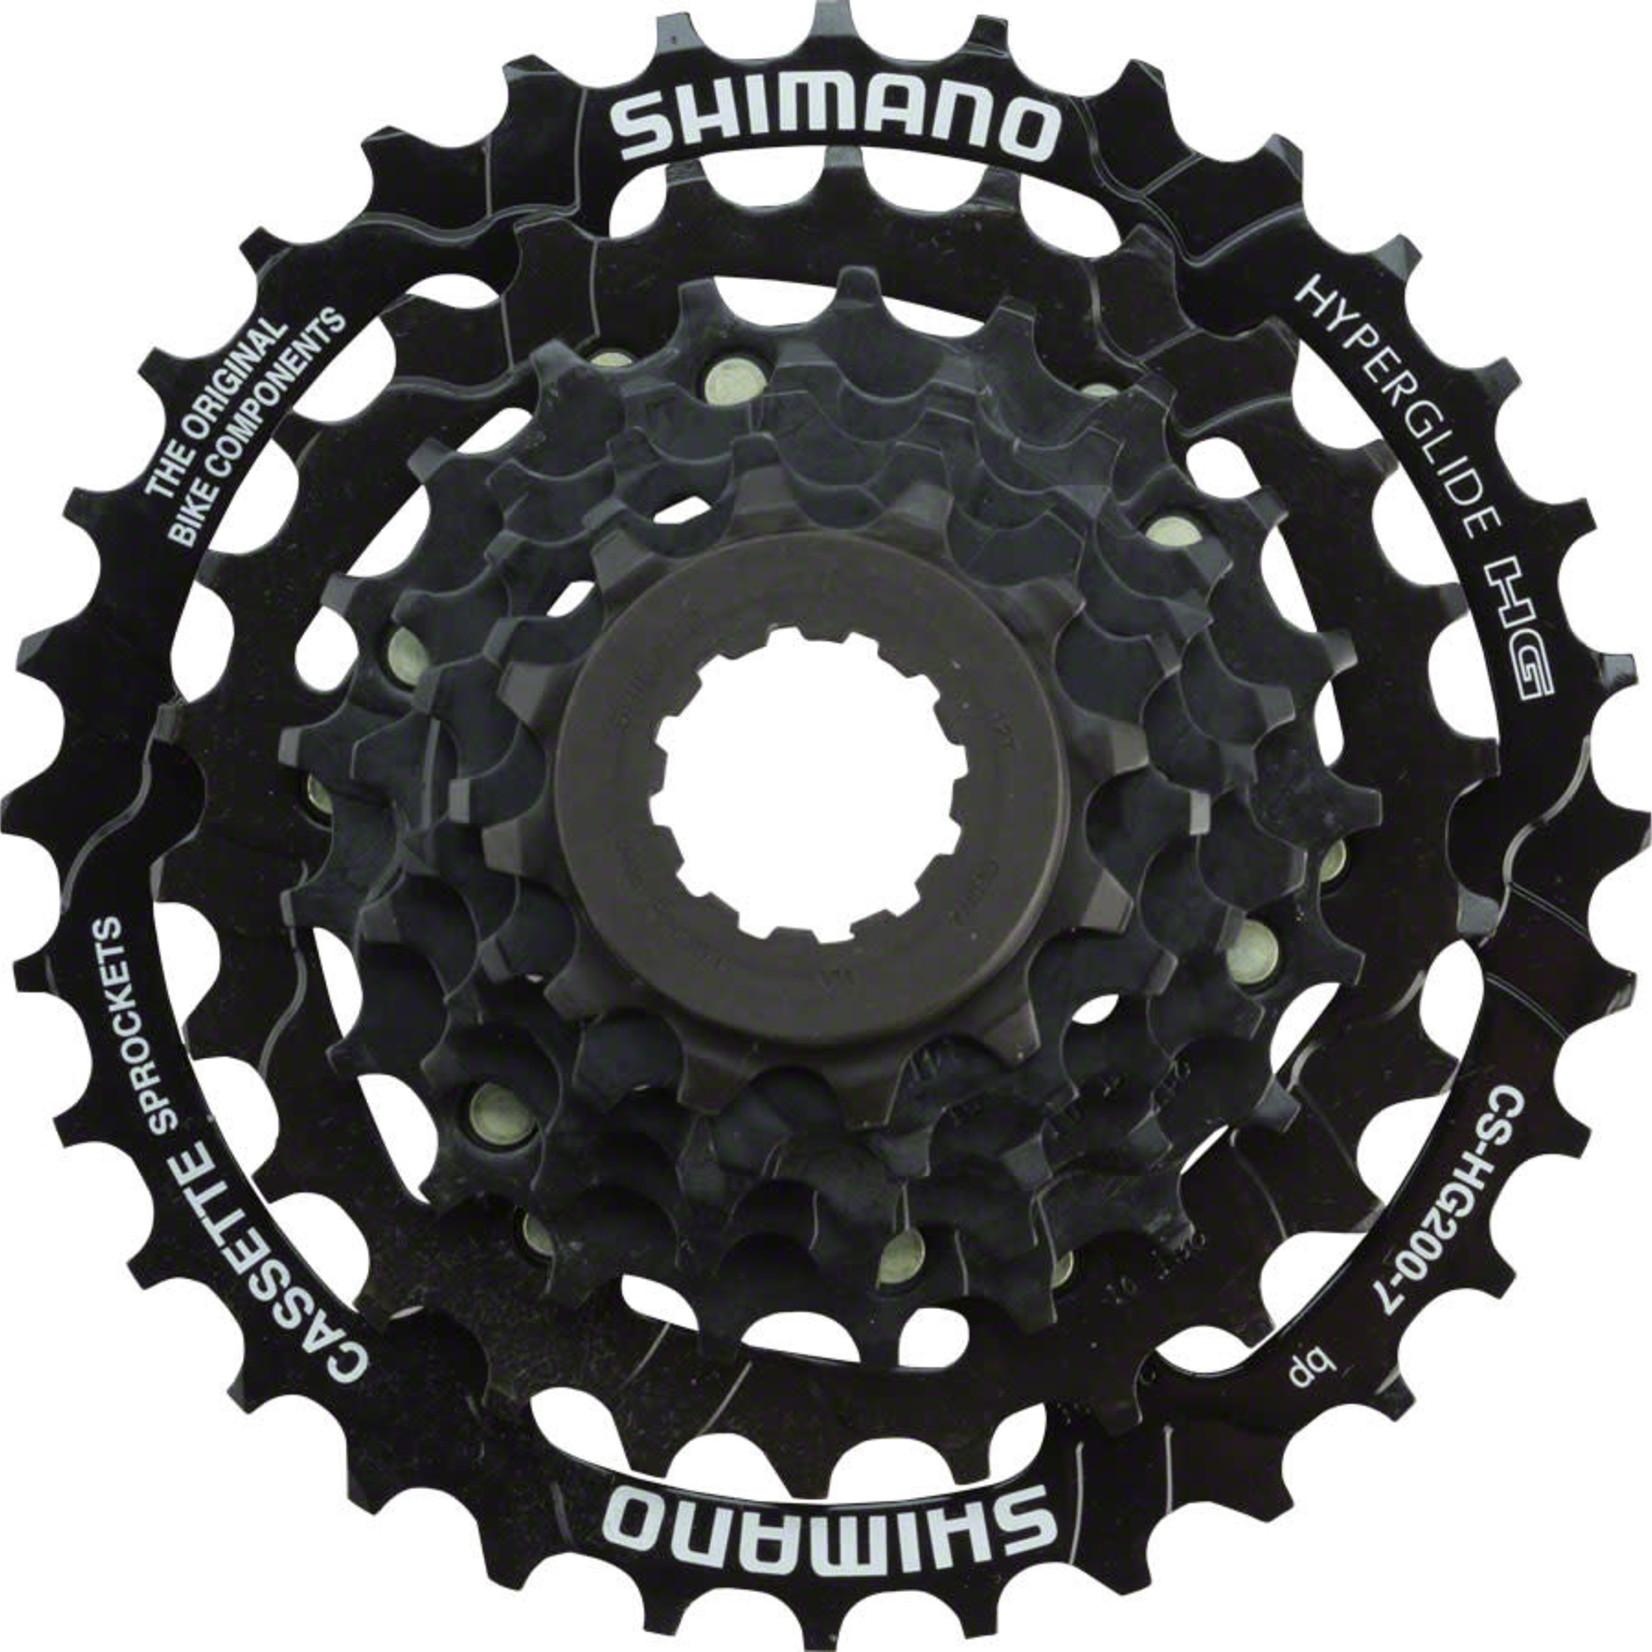 Shimano Shimano Tourney CS-HG200 Cassette - 7 Speed, 12-32t, Black